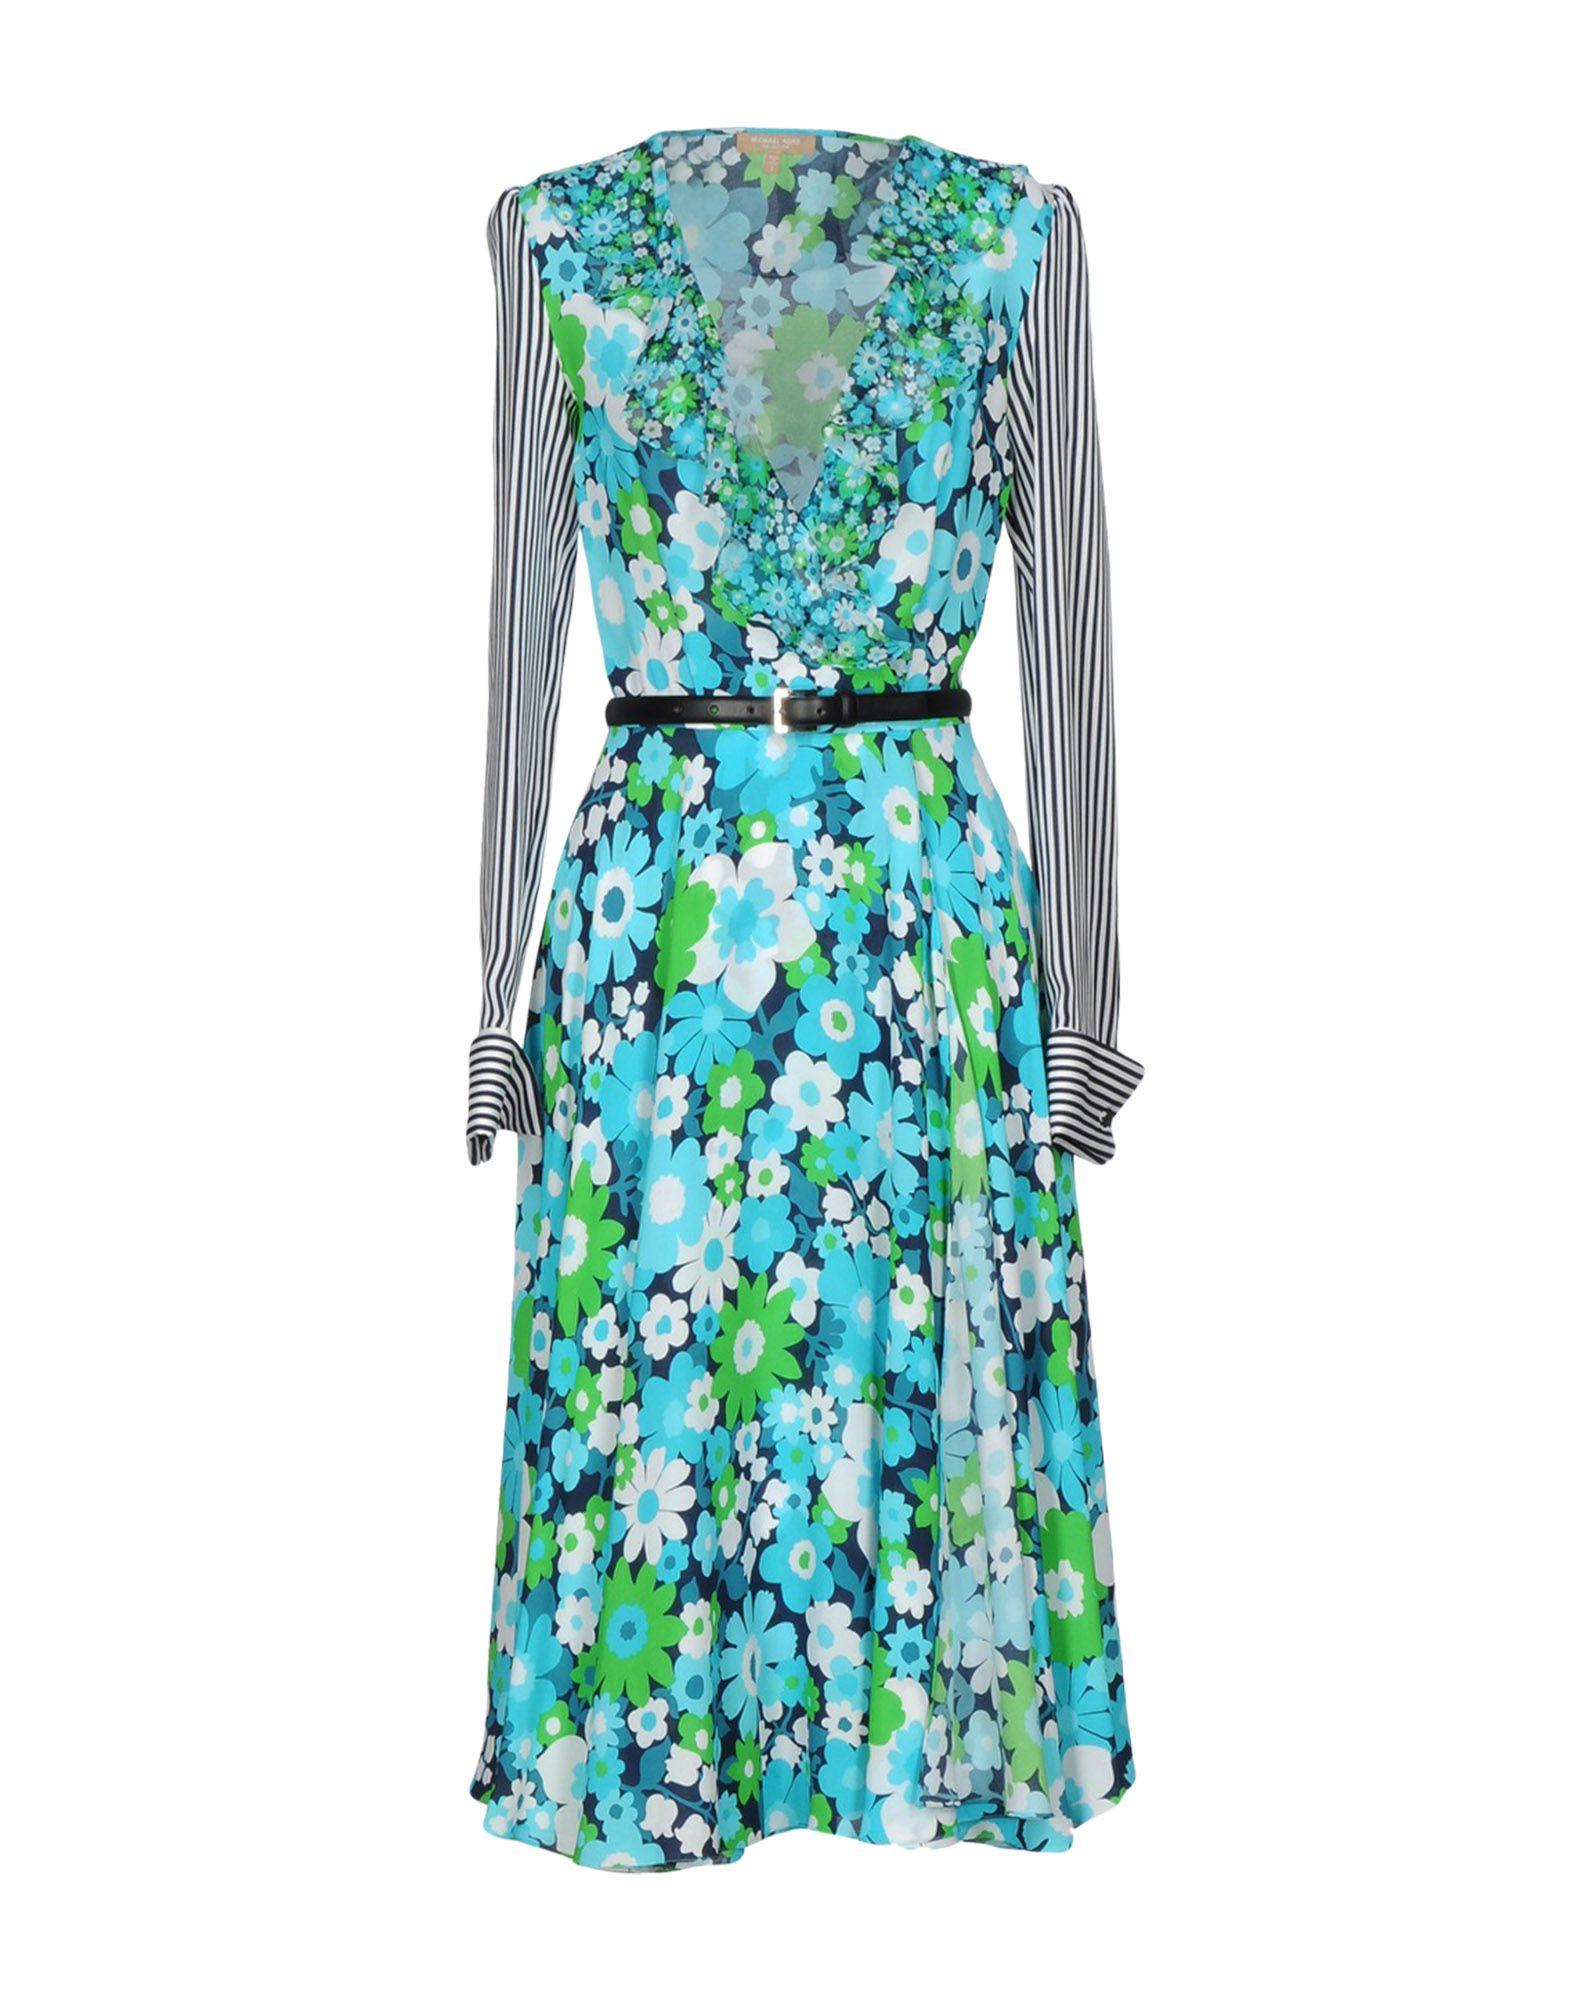 MICHAEL KORS COLLECTION Платье длиной 3/4 michael kors платье длиной 3 4